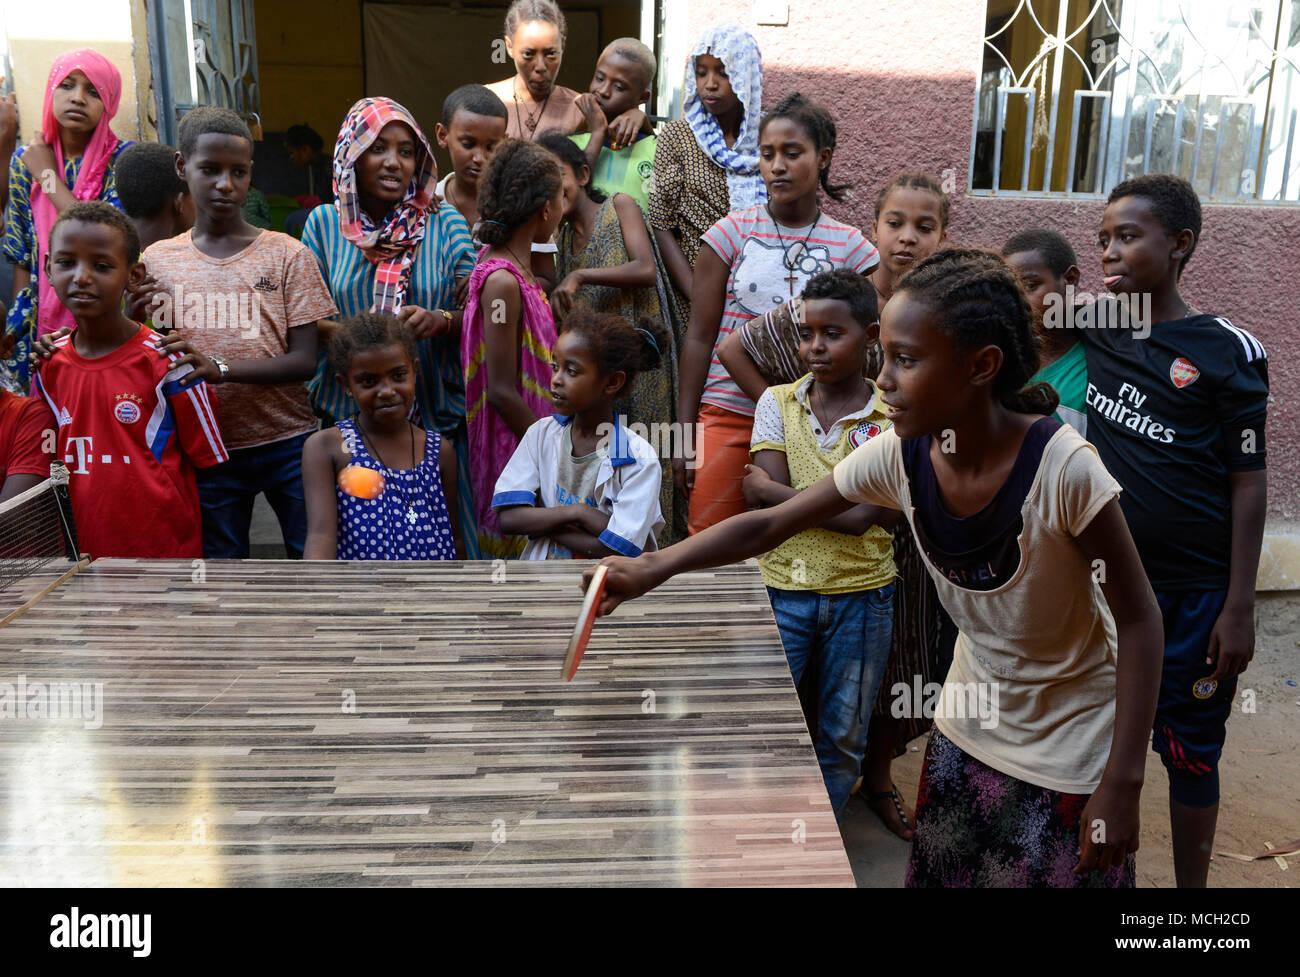 L' ETIOPIA Dire Dawa, bambini giocare a ping pong / AETHIOPIEN, Dire Dawa, Kinder spielen Tischtennis Immagini Stock